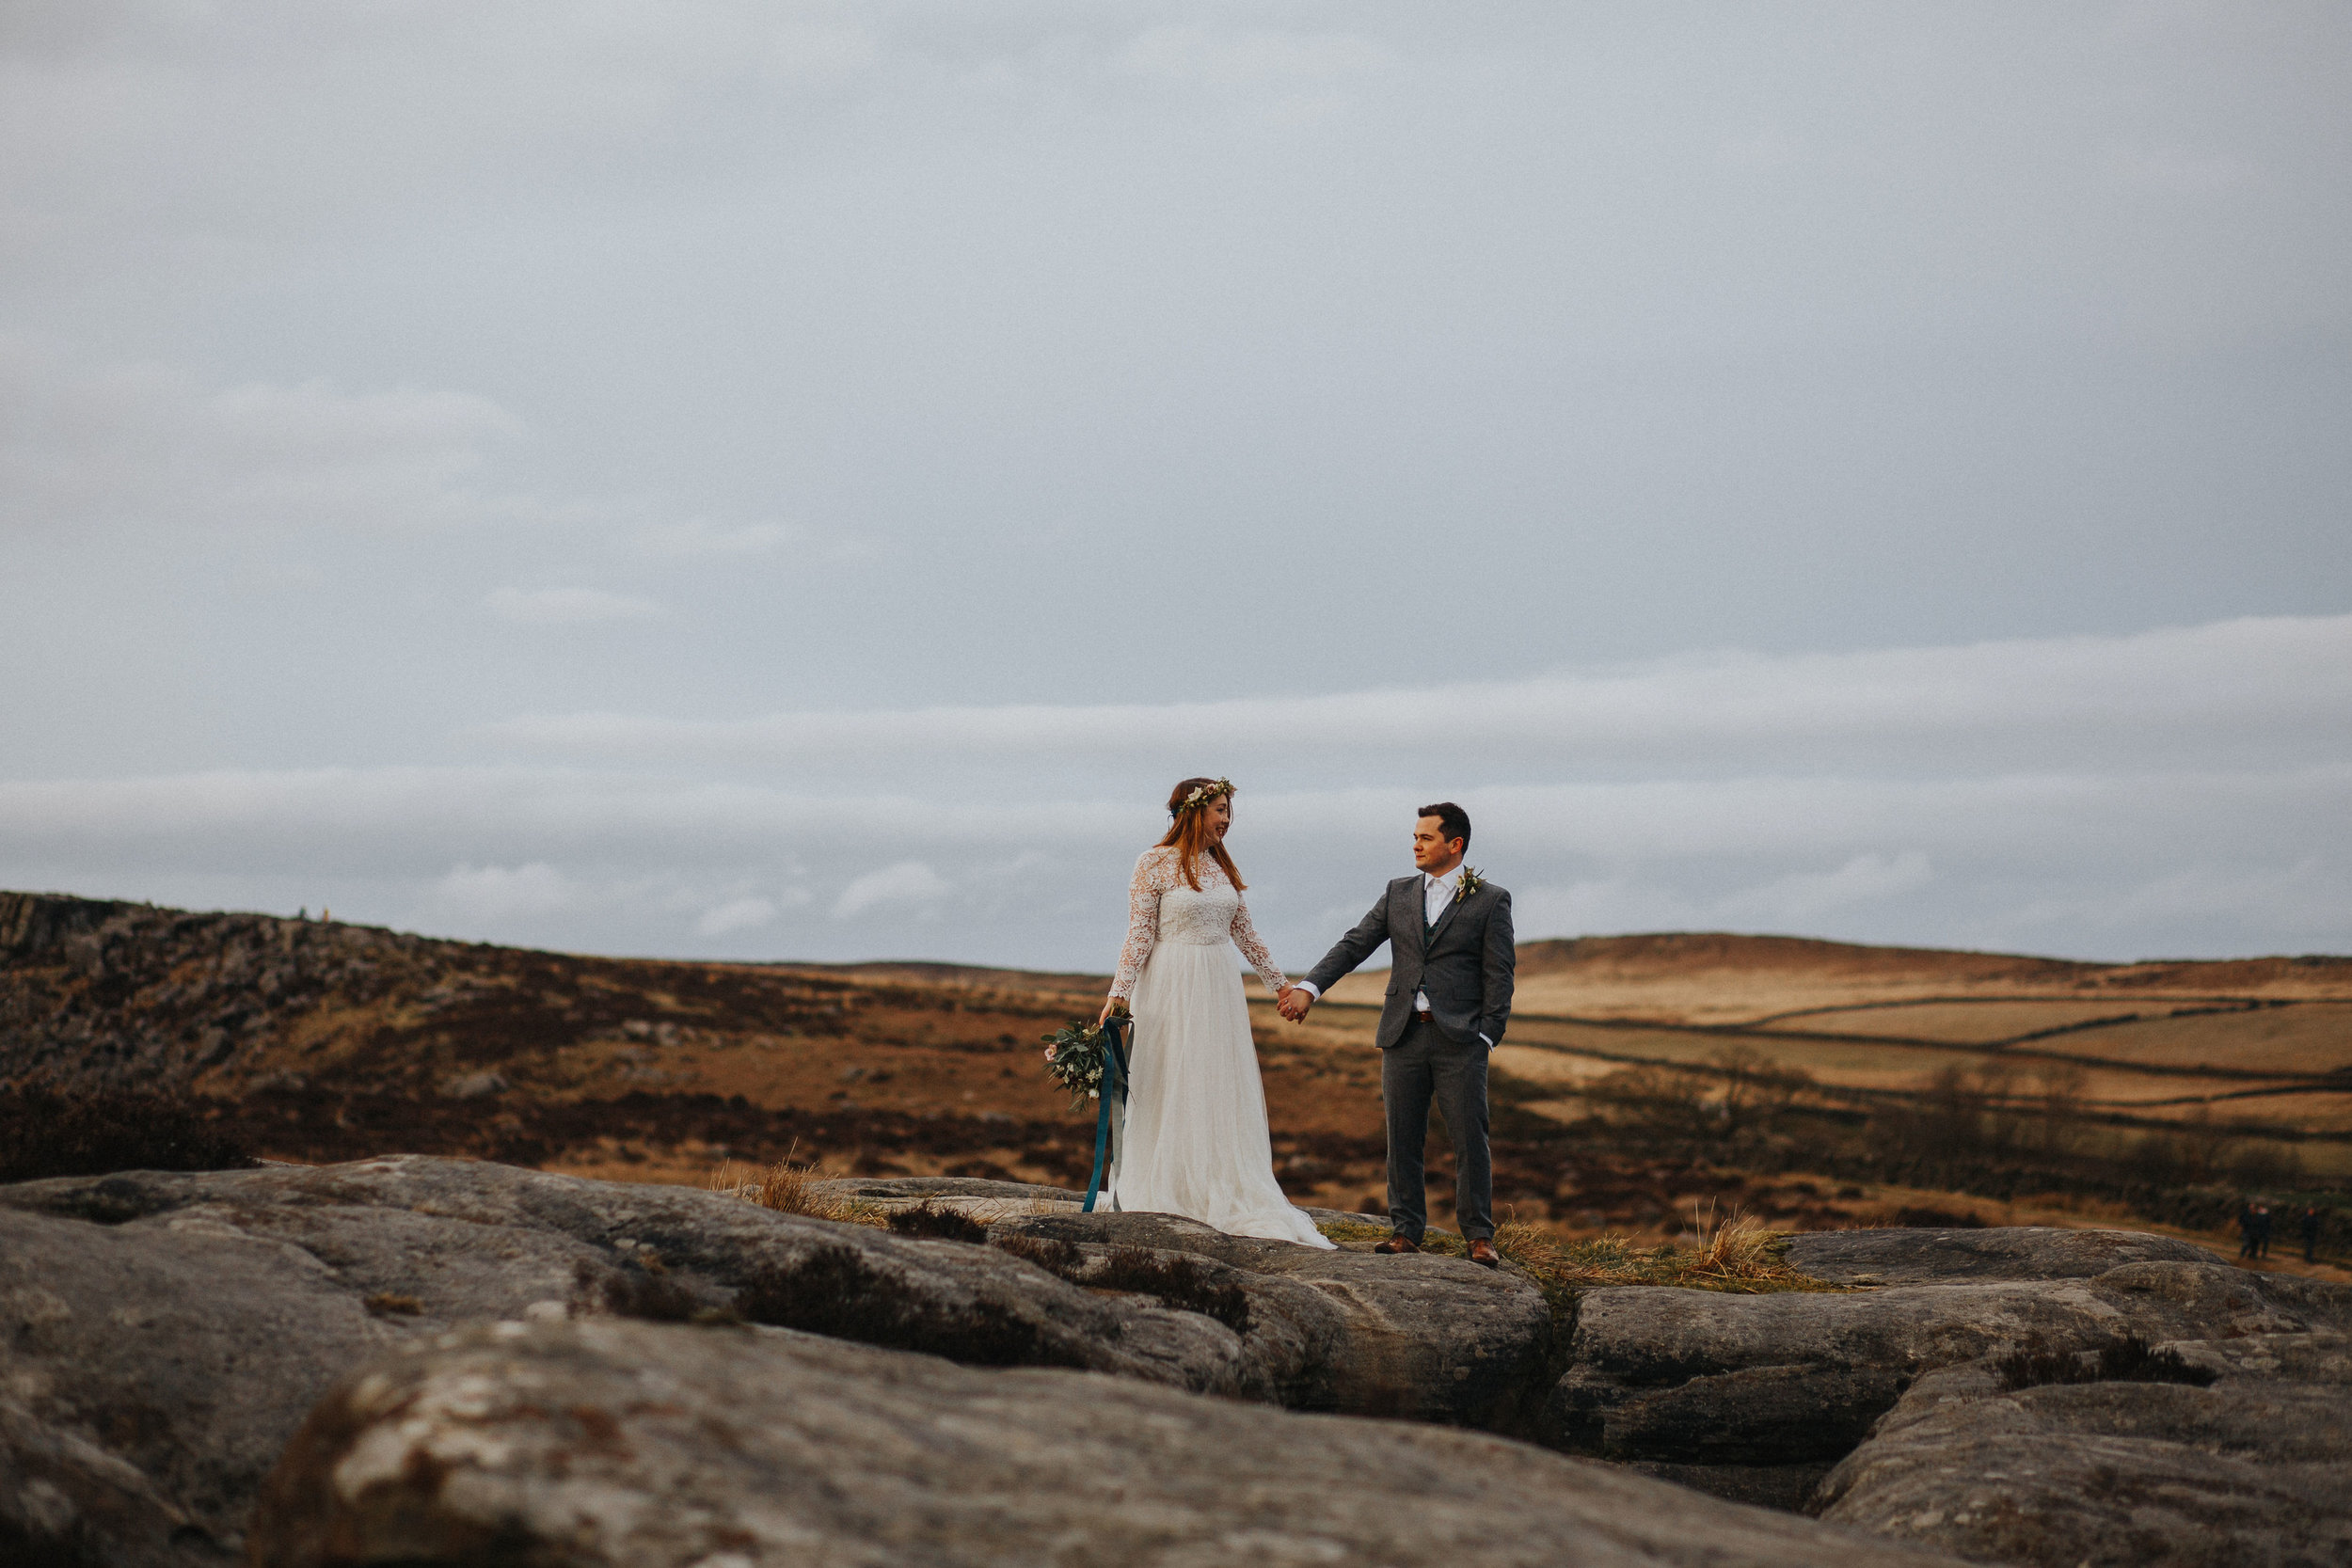 Rosie-bespoke-lace-long sleeved-tulle-wedding-dress-winter-peak district-susanna greening-29.jpg